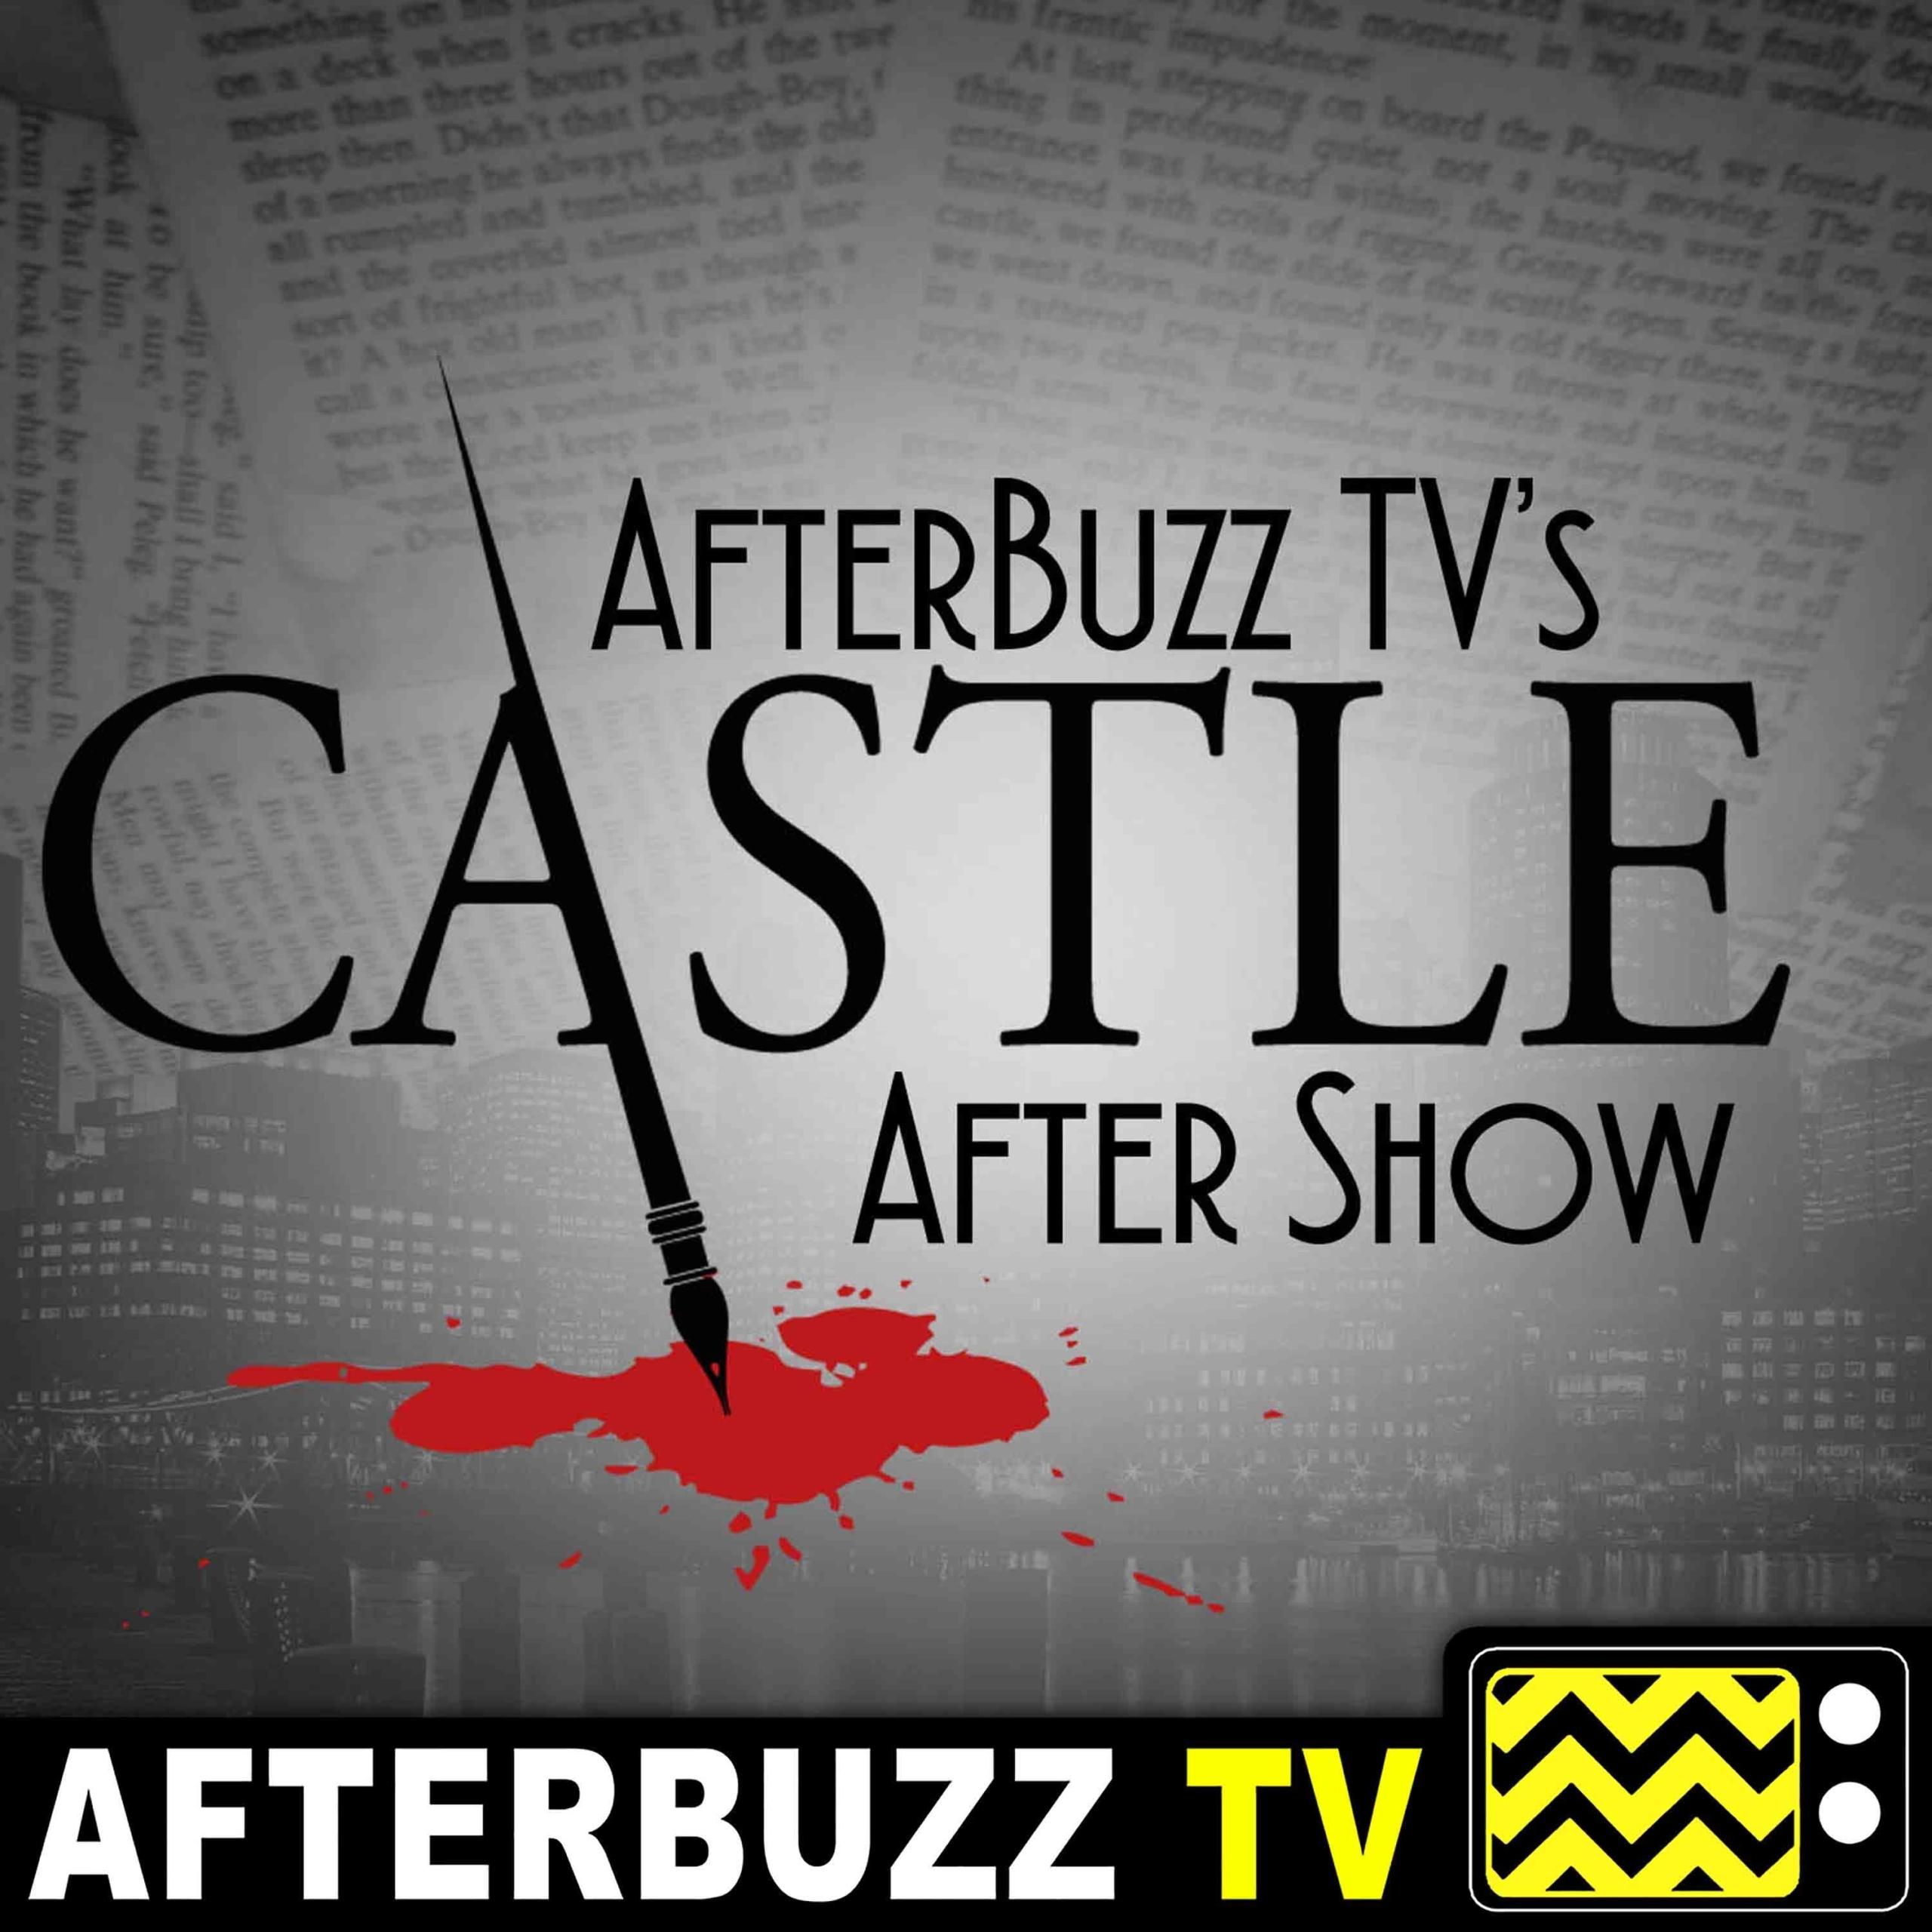 Castle S:8 | Crossfire E:22 | AfterBuzz TV AfterShow